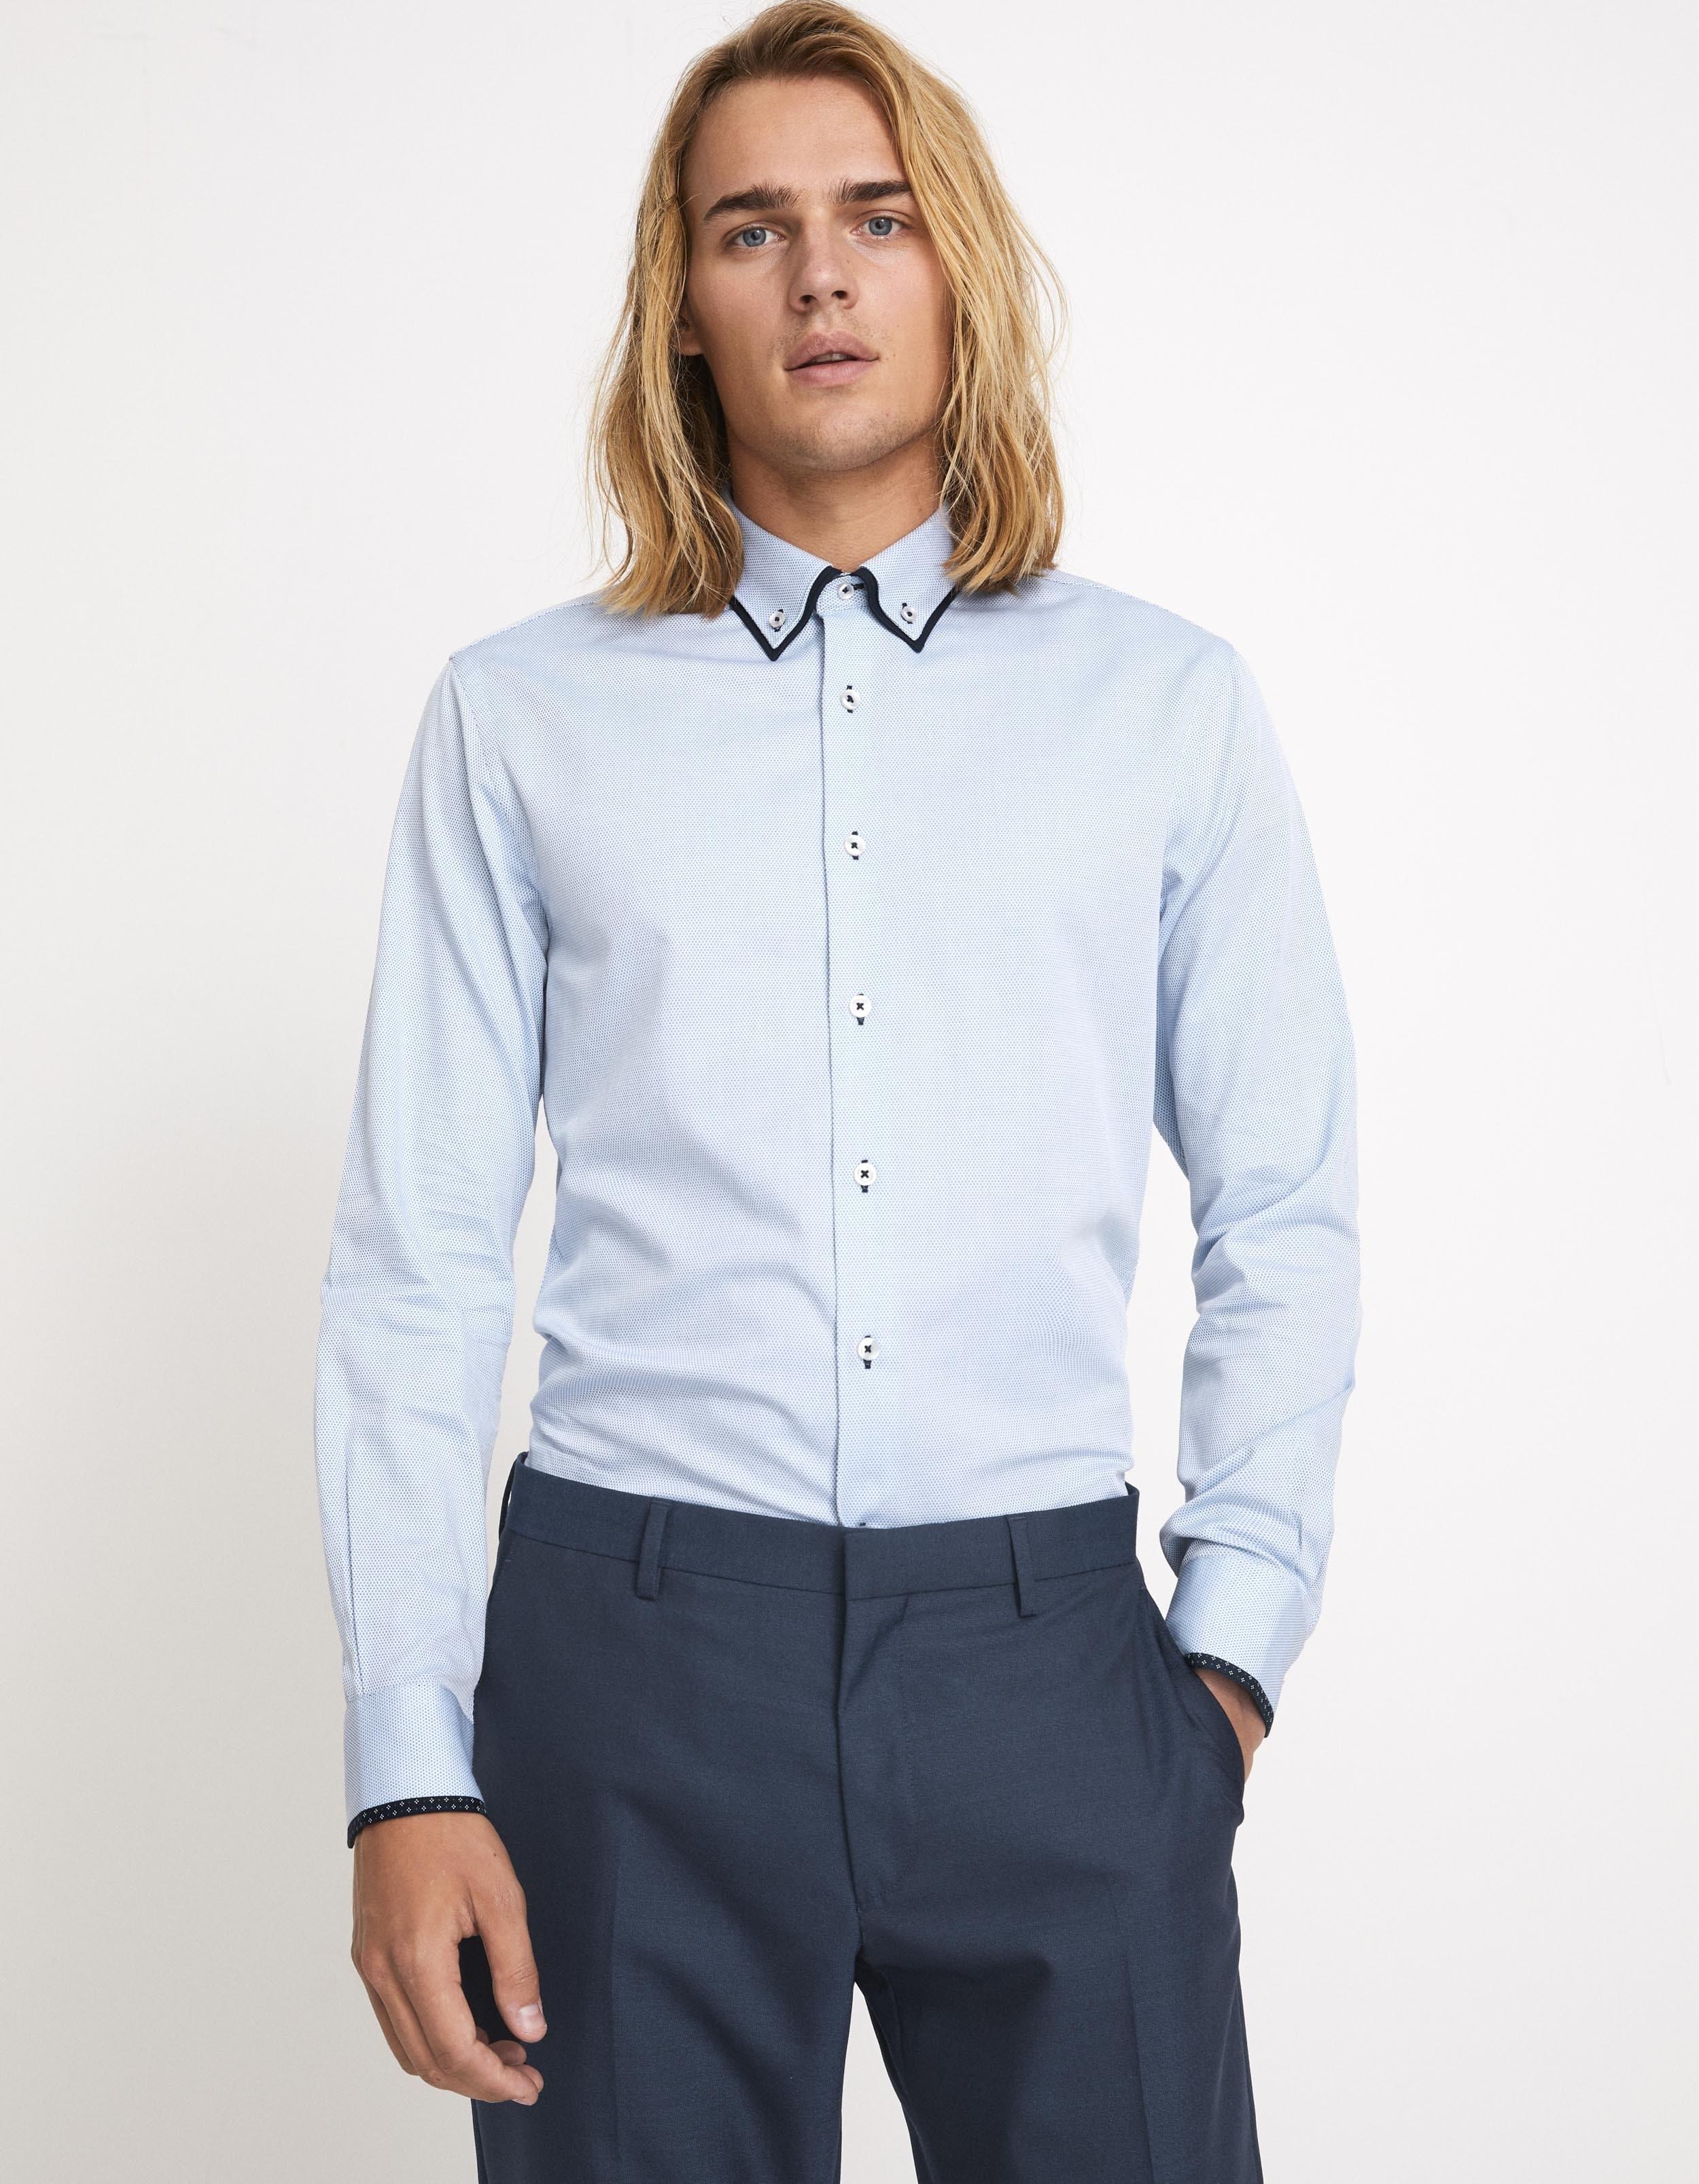 chemise slim 100% coton texturée Celio Club Prix 39,99 €